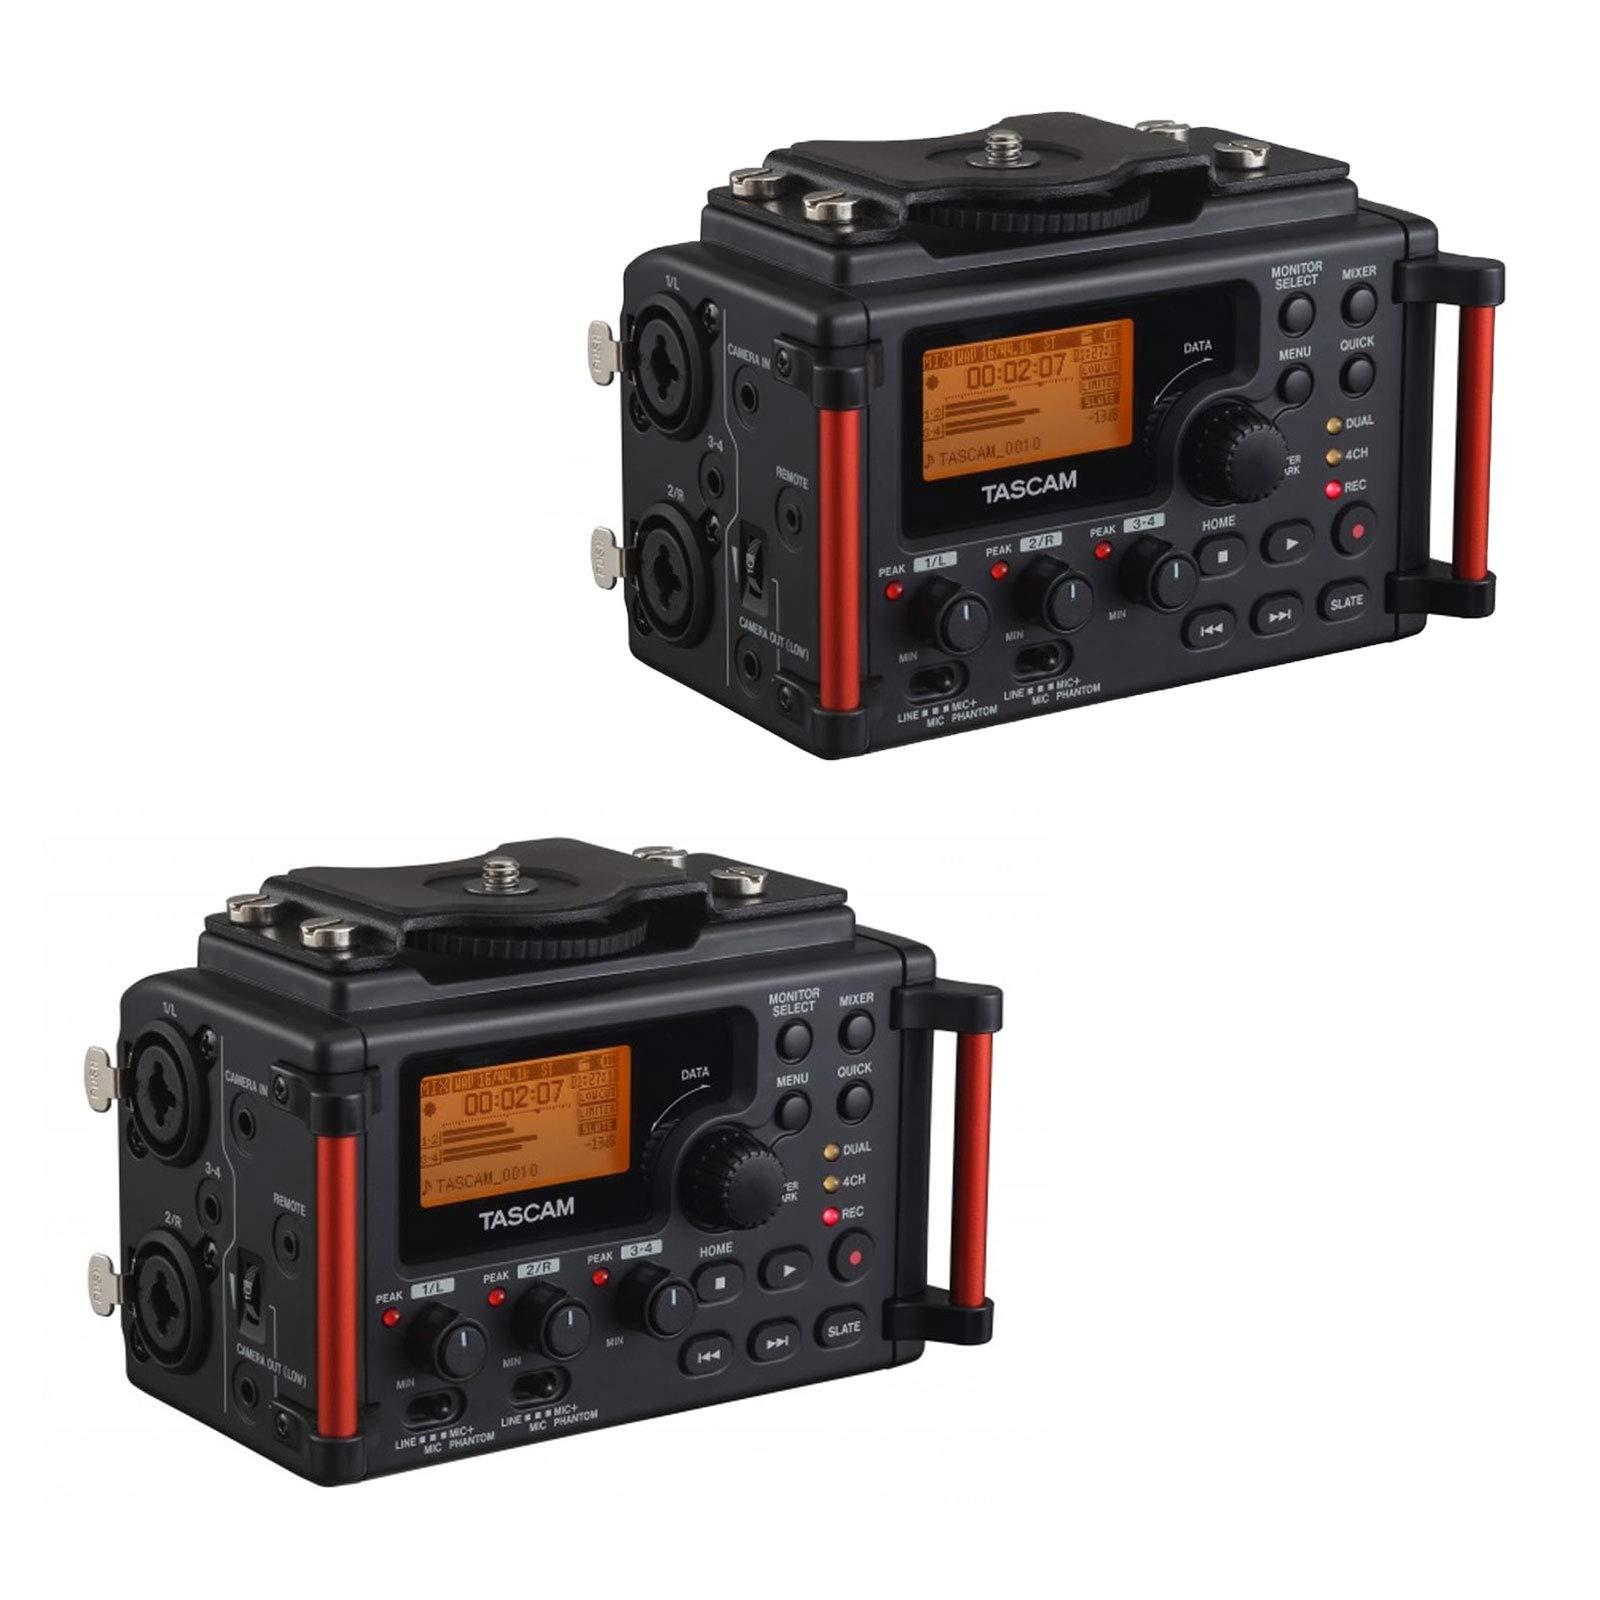 Tascam 4-Channel Linear PCM Audio Portable DSLR Film Recorder/Mixer (2 Pack)